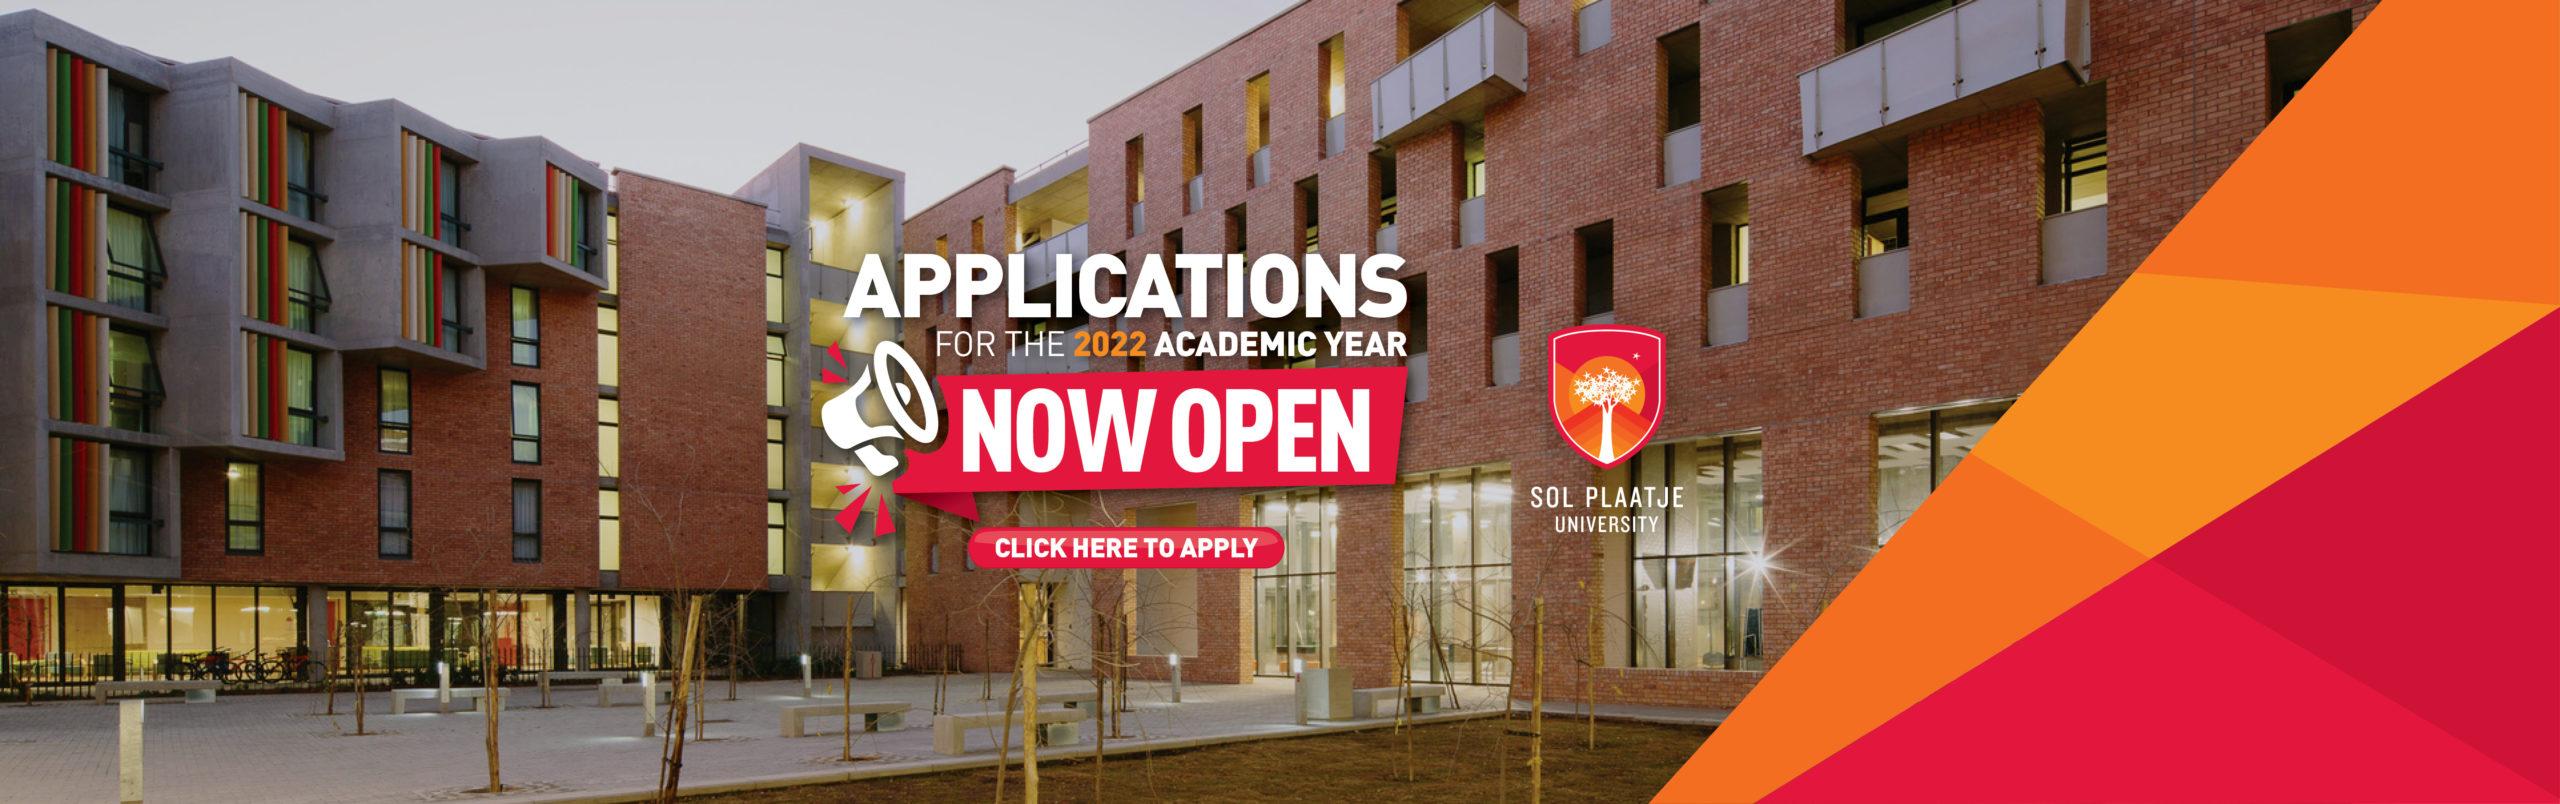 2022 applications